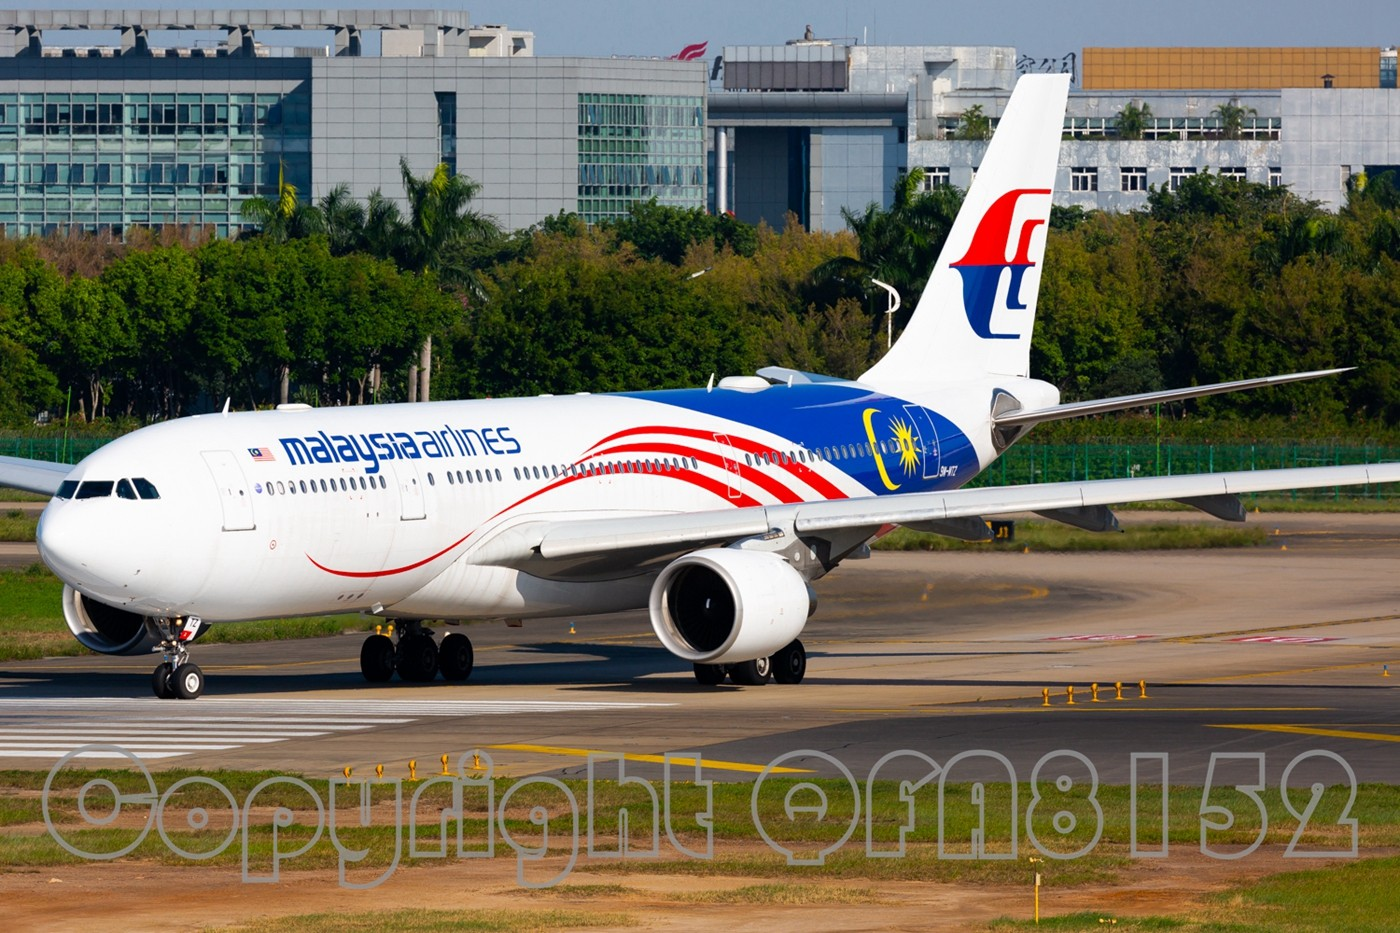 Re:[原创]现在发图好像有钱拿了? AIRBUS A320-200 9M-MTZ 中国广州白云国际机场